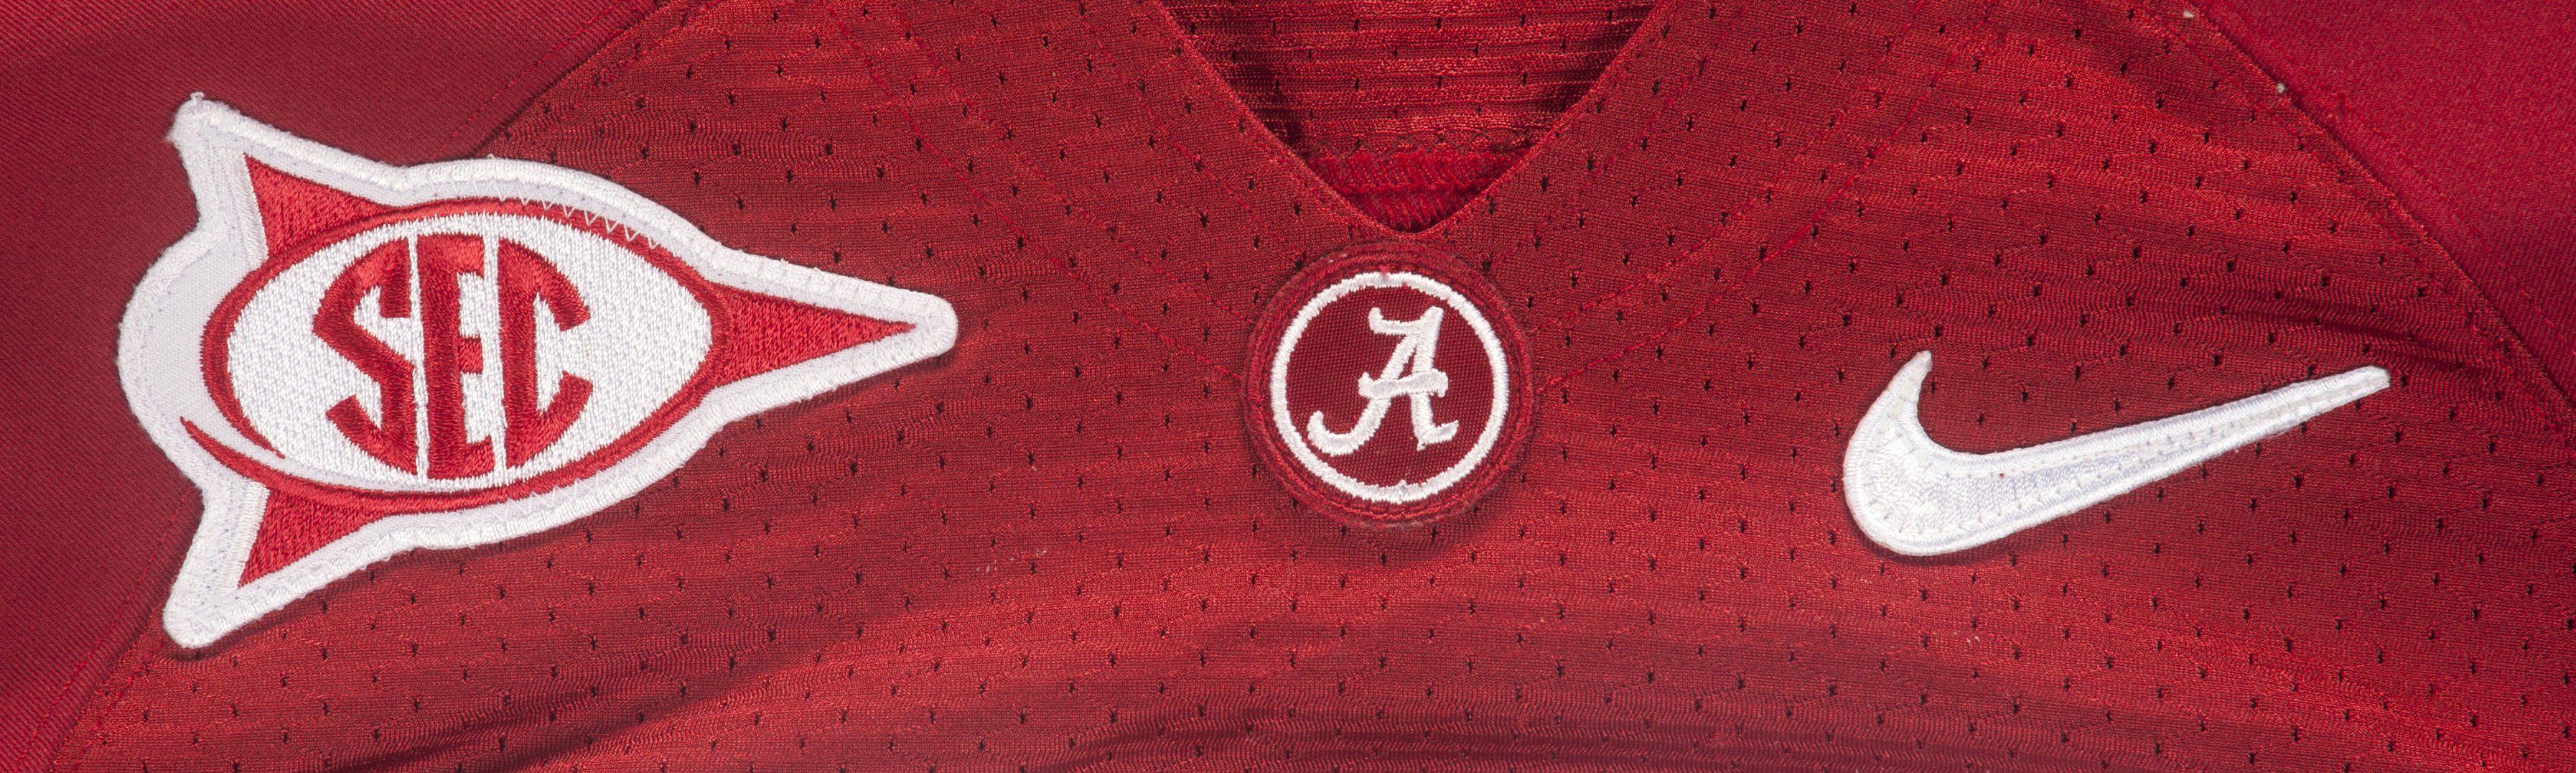 Cool Alabama Football Backgrounds Wallpaper Alabama HD